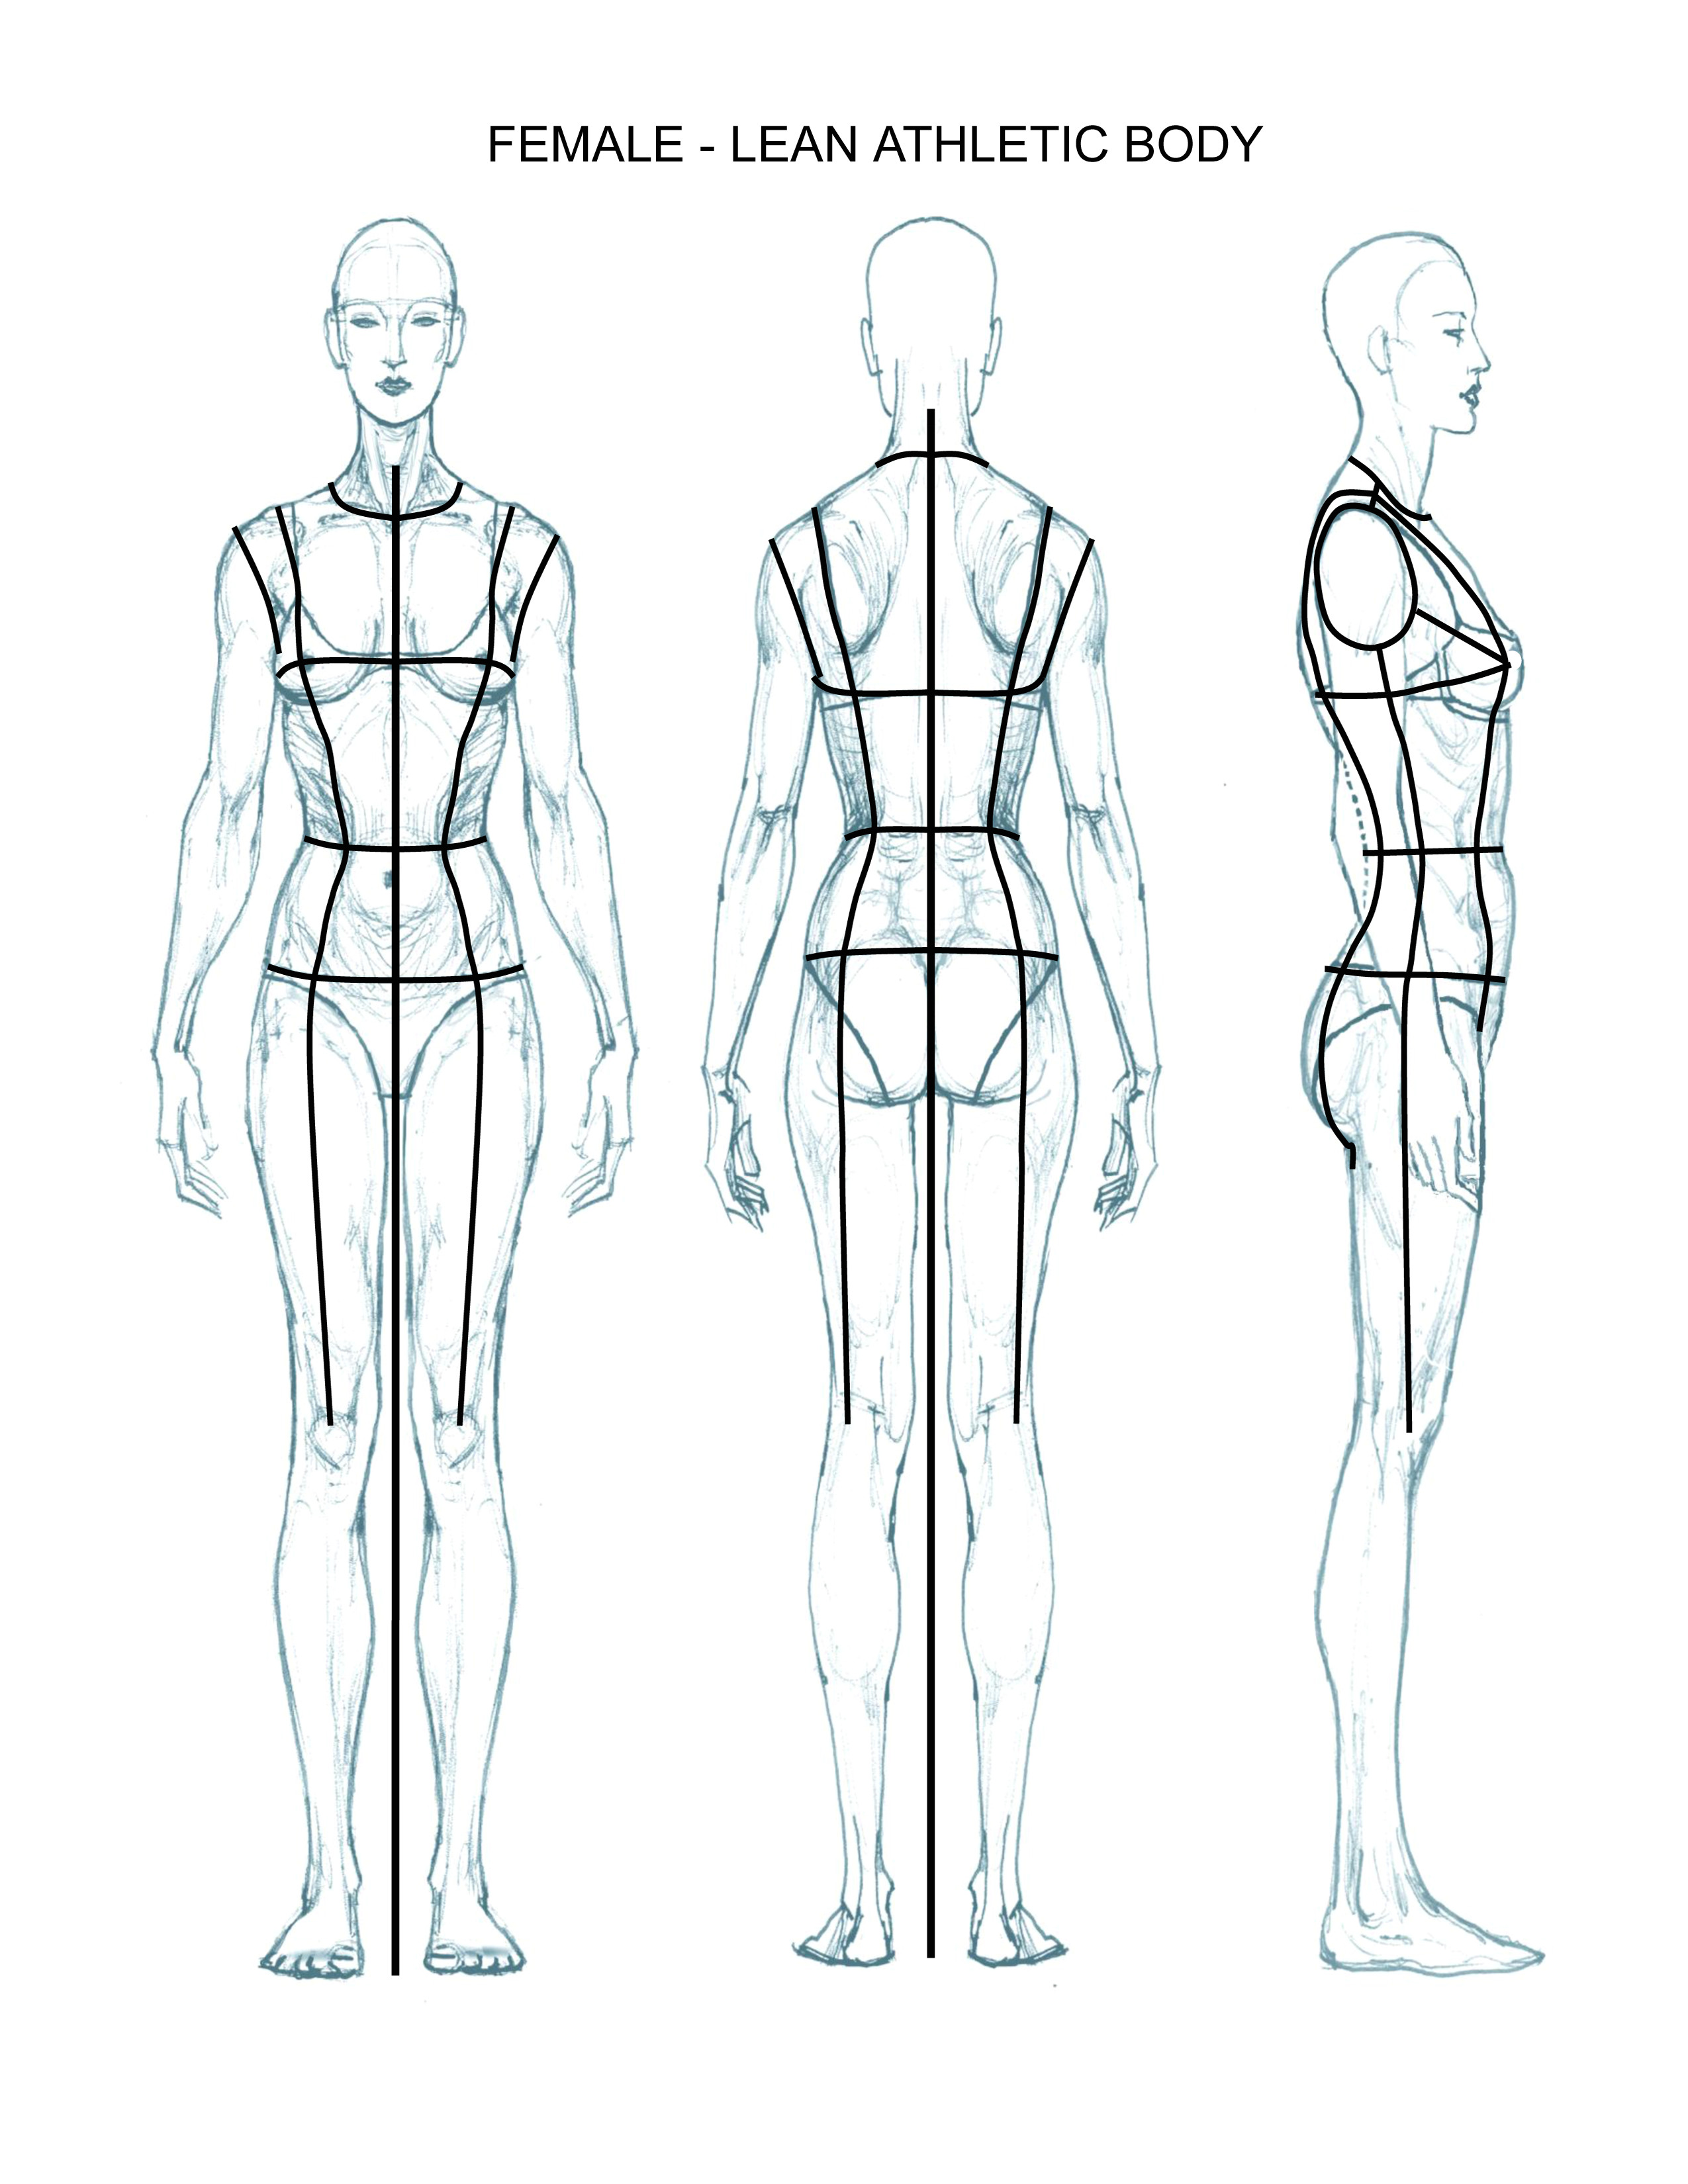 Textiles Body Templates Drawing Fashion E Book Series Justine Limpus Parish 39 S Blog